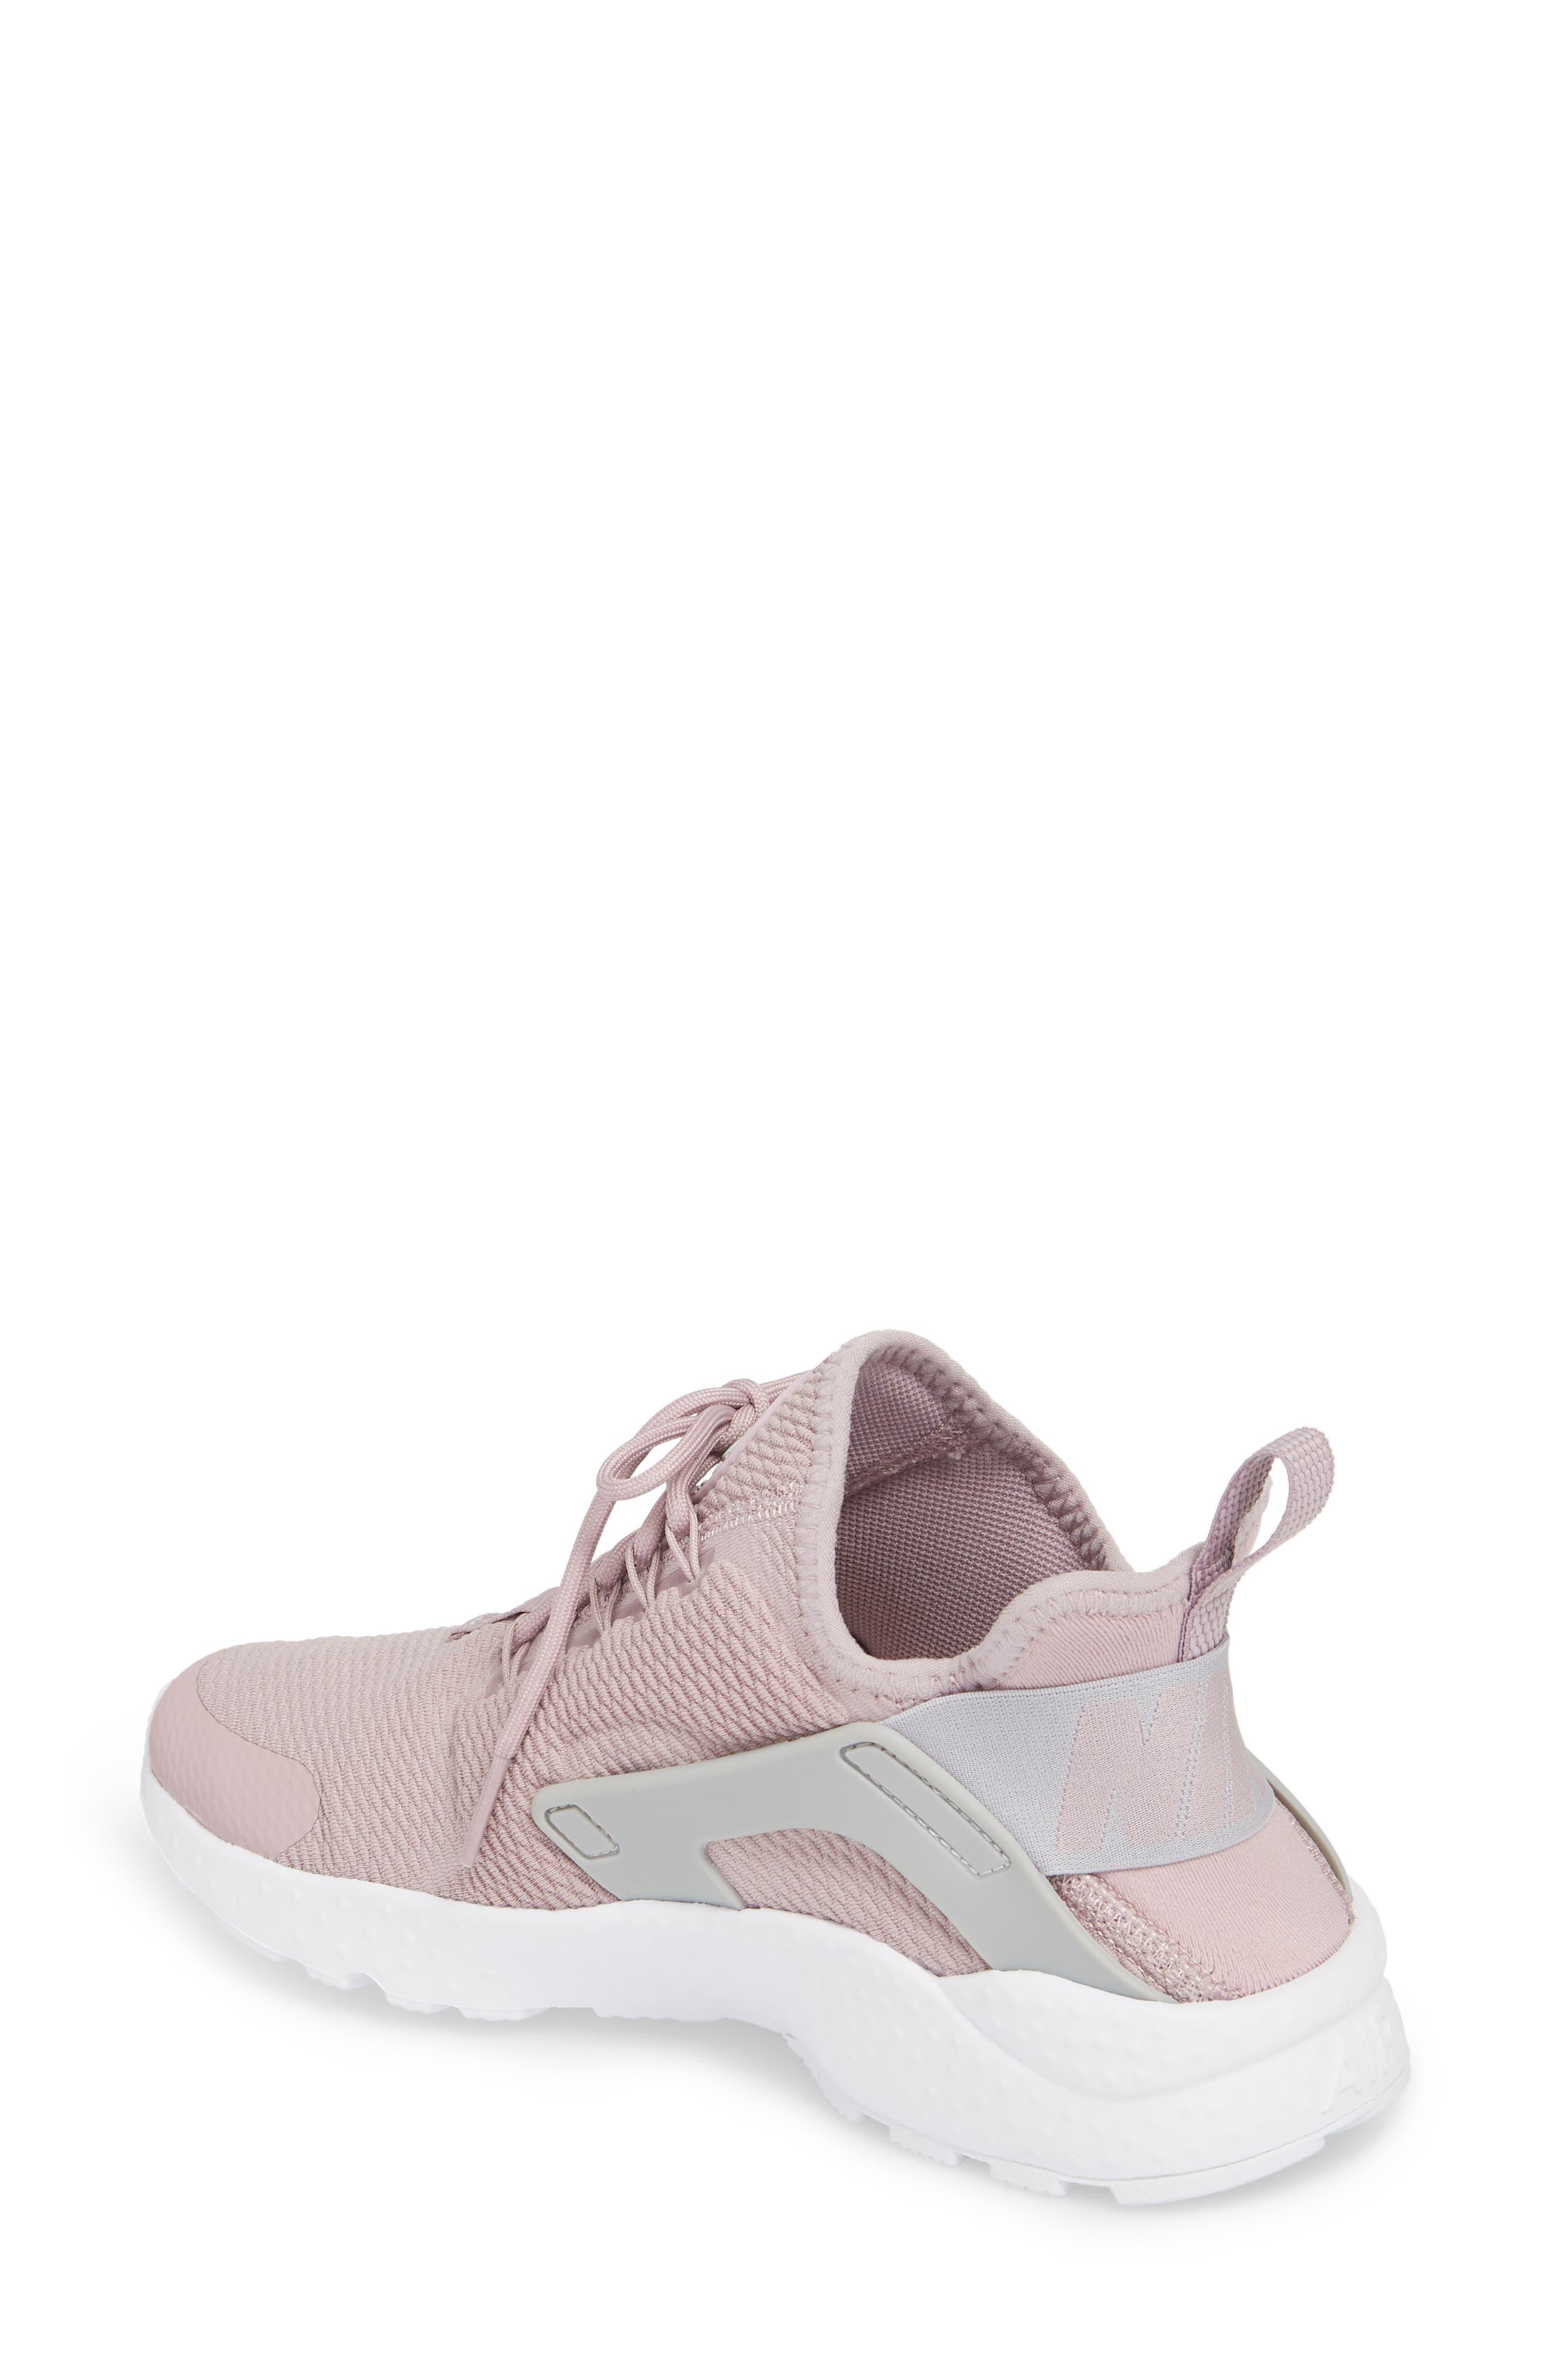 Air Huarache Sneaker,                             Alternate thumbnail 2, color,                             Elemental Rose/ Wolf Grey